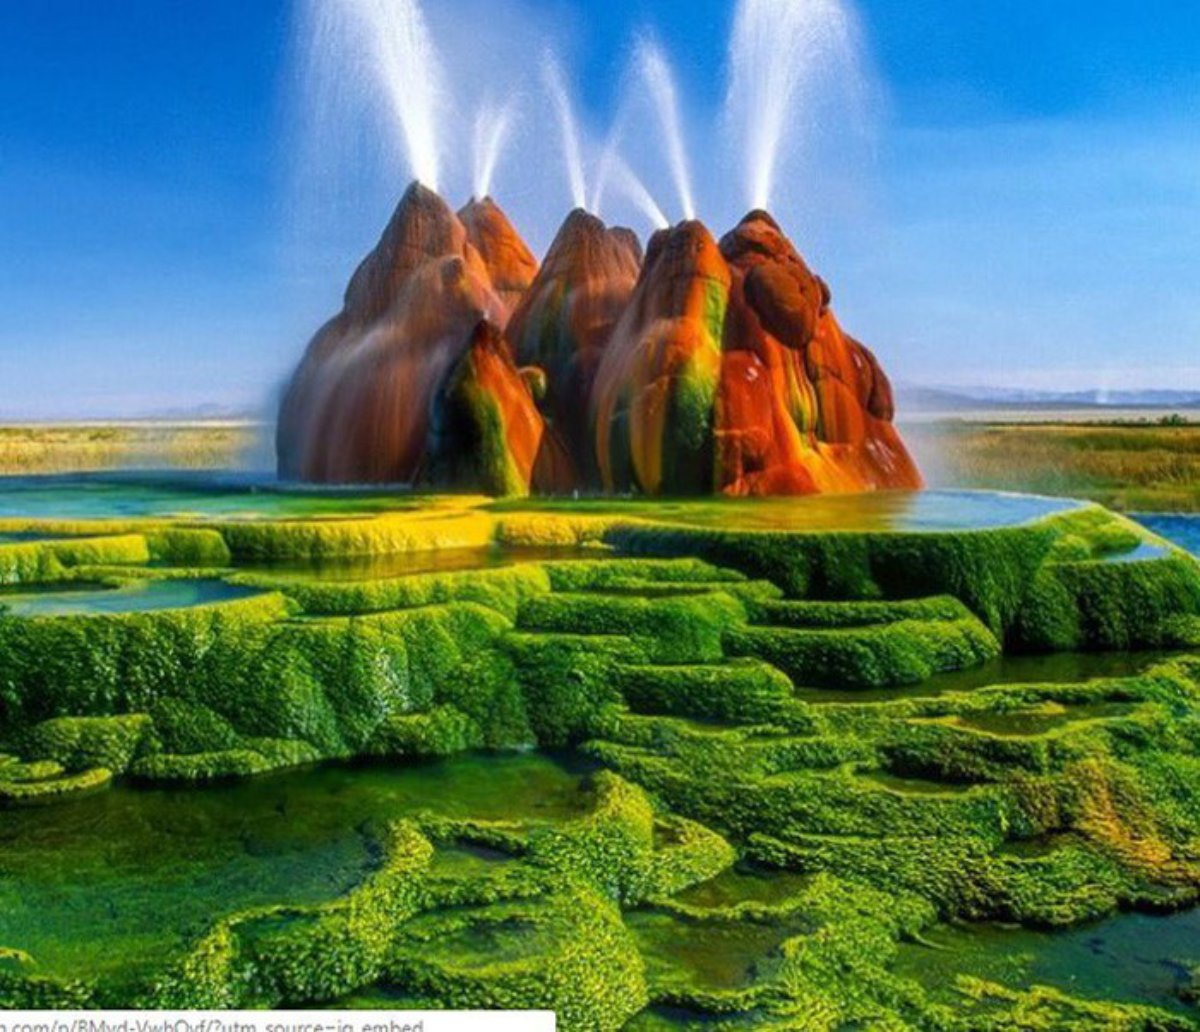 Hồ Hillier, Utah, Ethiopia, Maldives, Nevada, thiên văn học, sao Thổ, sao Chổi,sao Lùn Trắng